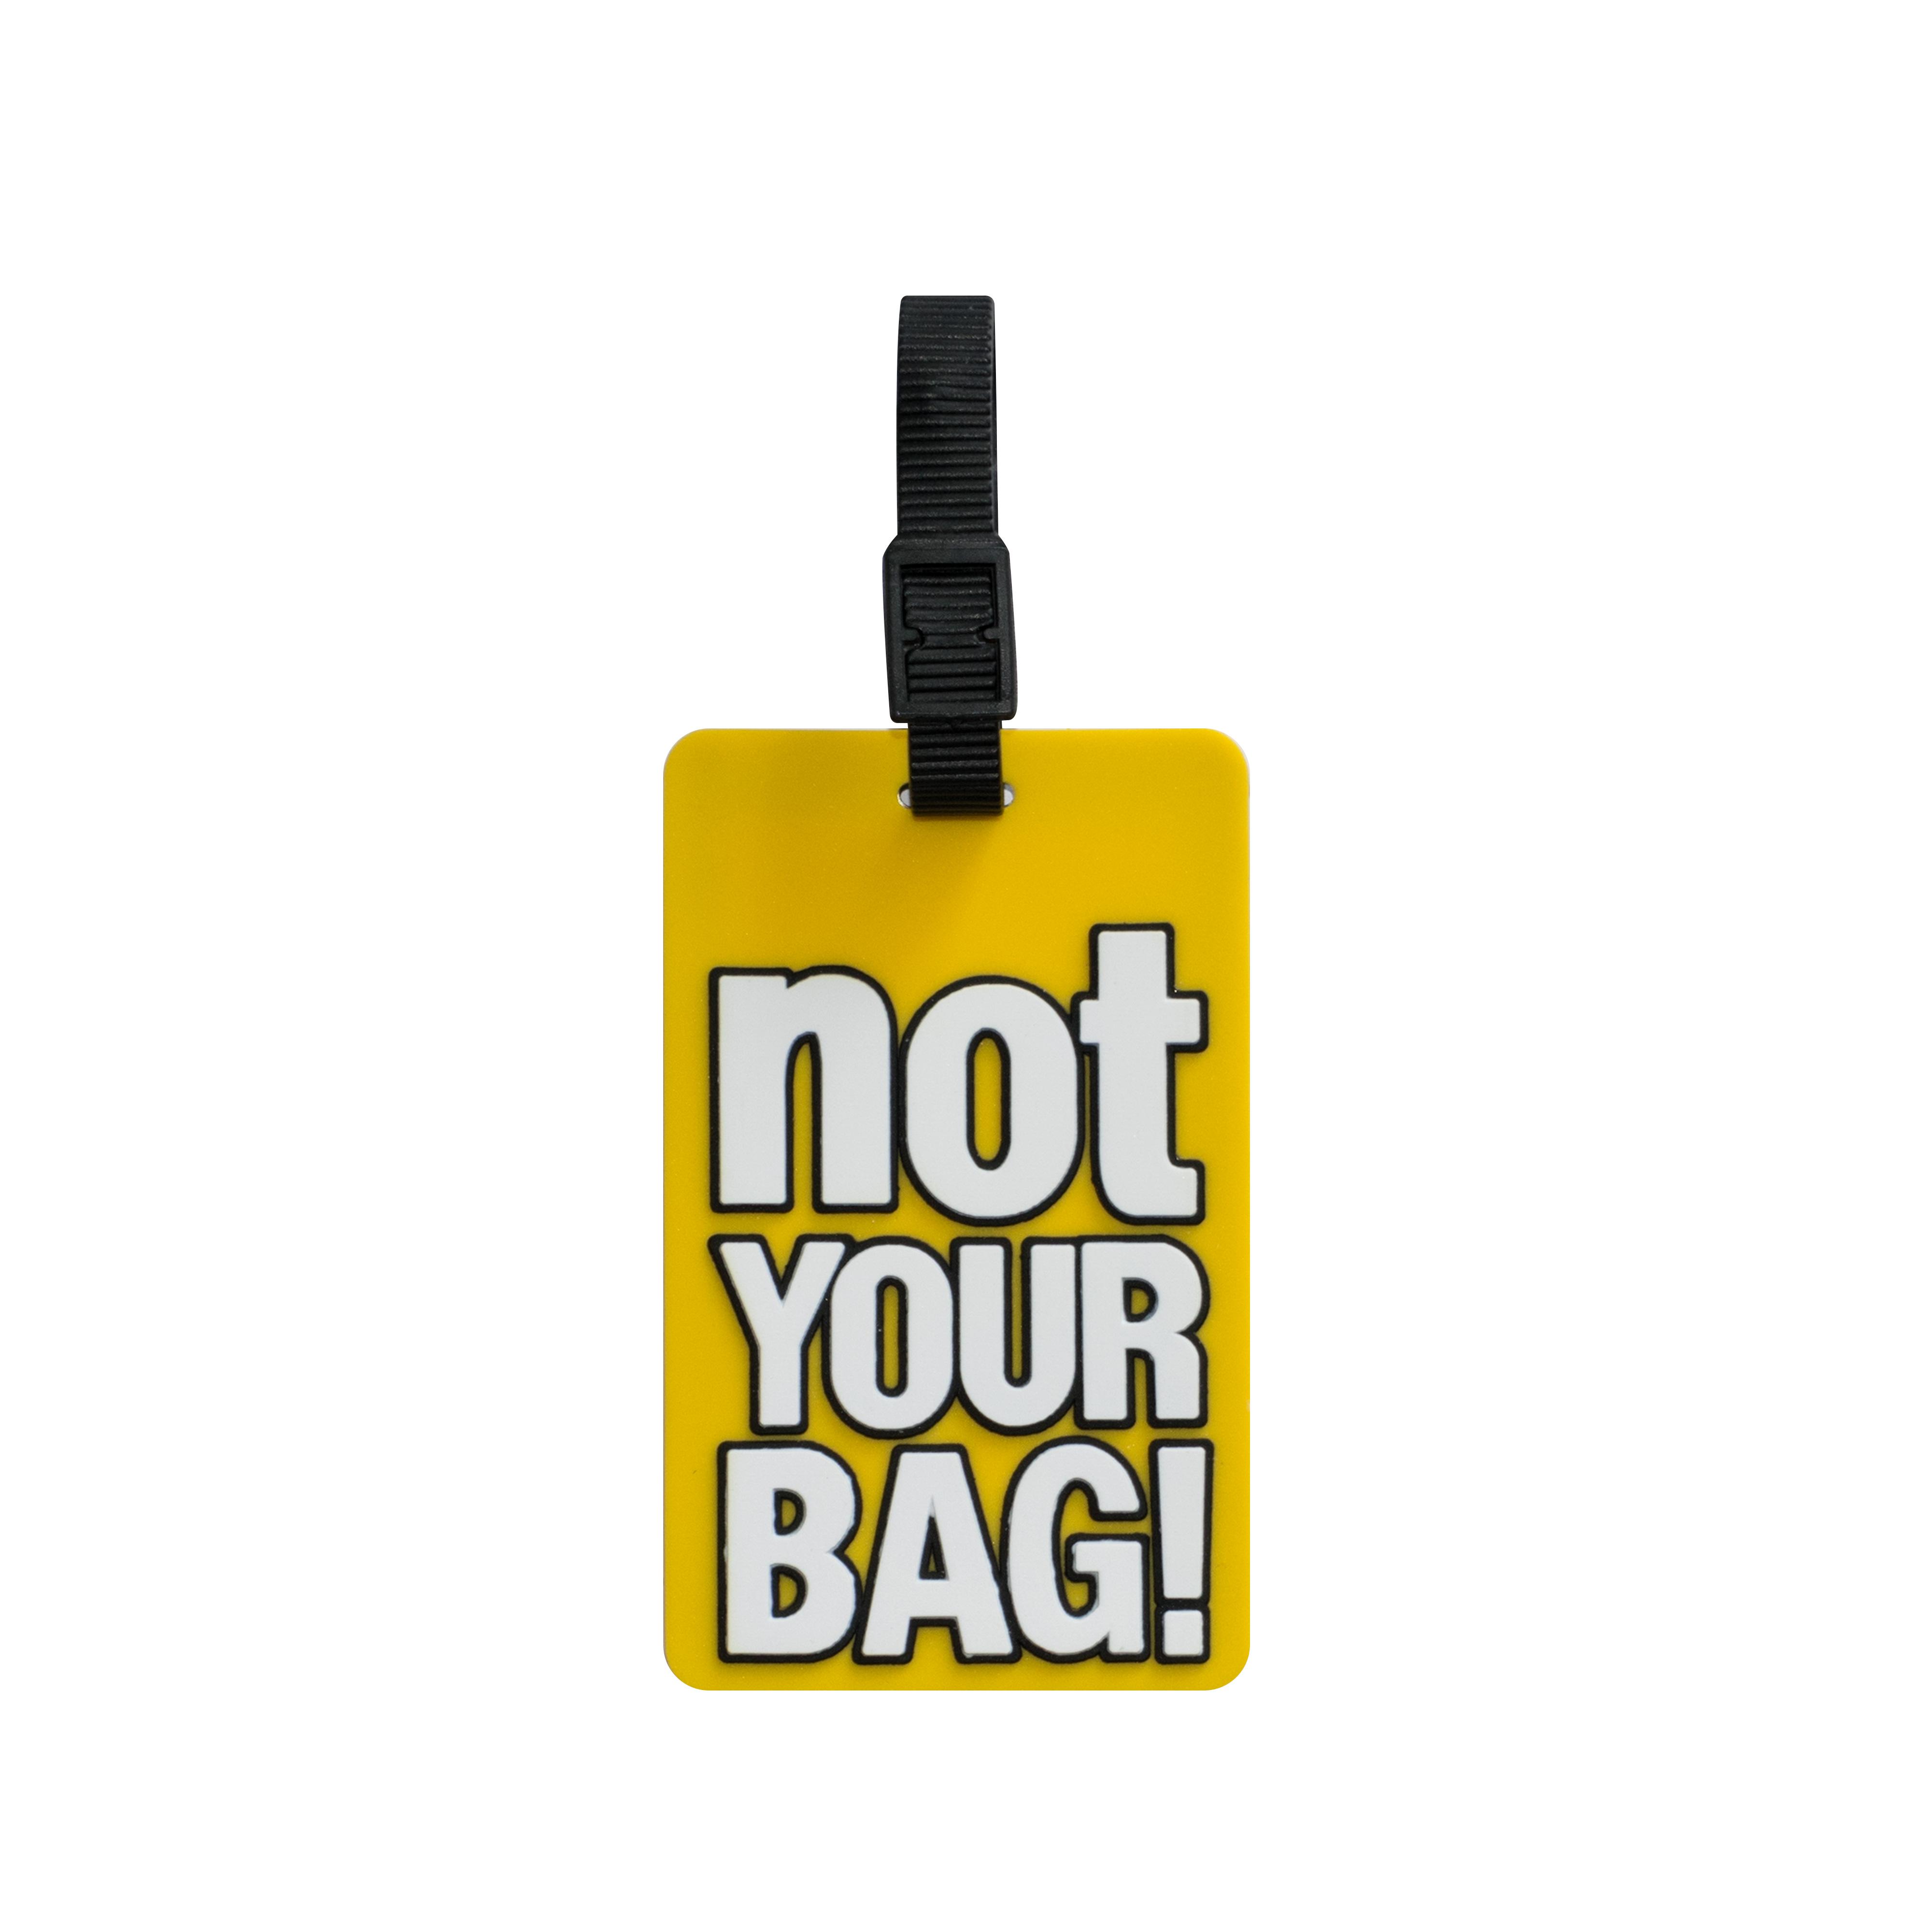 a858bb112da3 Shop TangoTag Luggage Tag - 'Not Your Bag!' - Yellow - HTC-TT813 ...